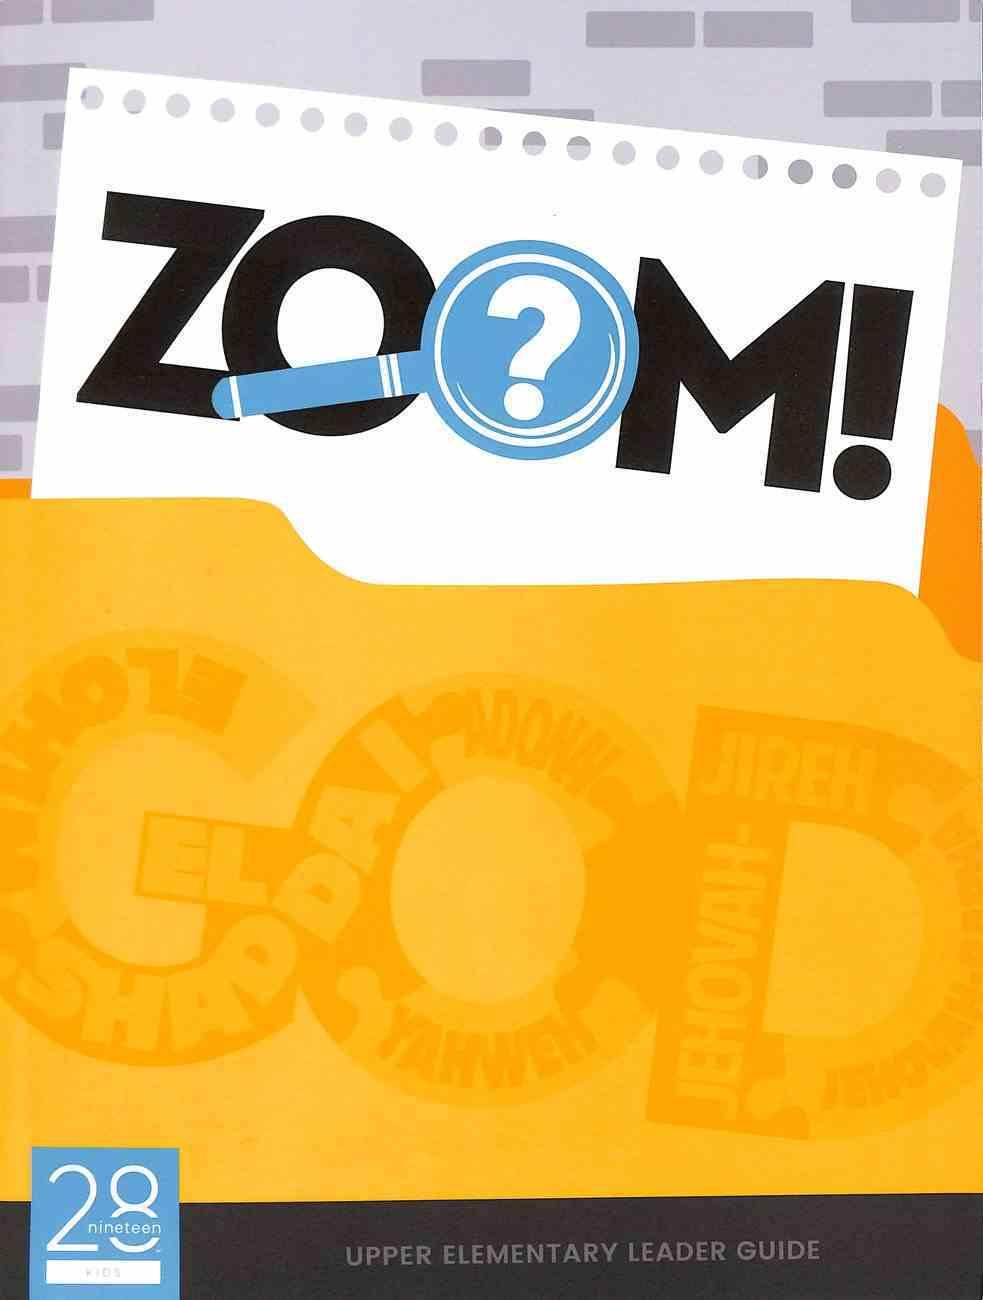 Upper Elementary (Leader Guide) (Zoom! Curriculum Series) Paperback